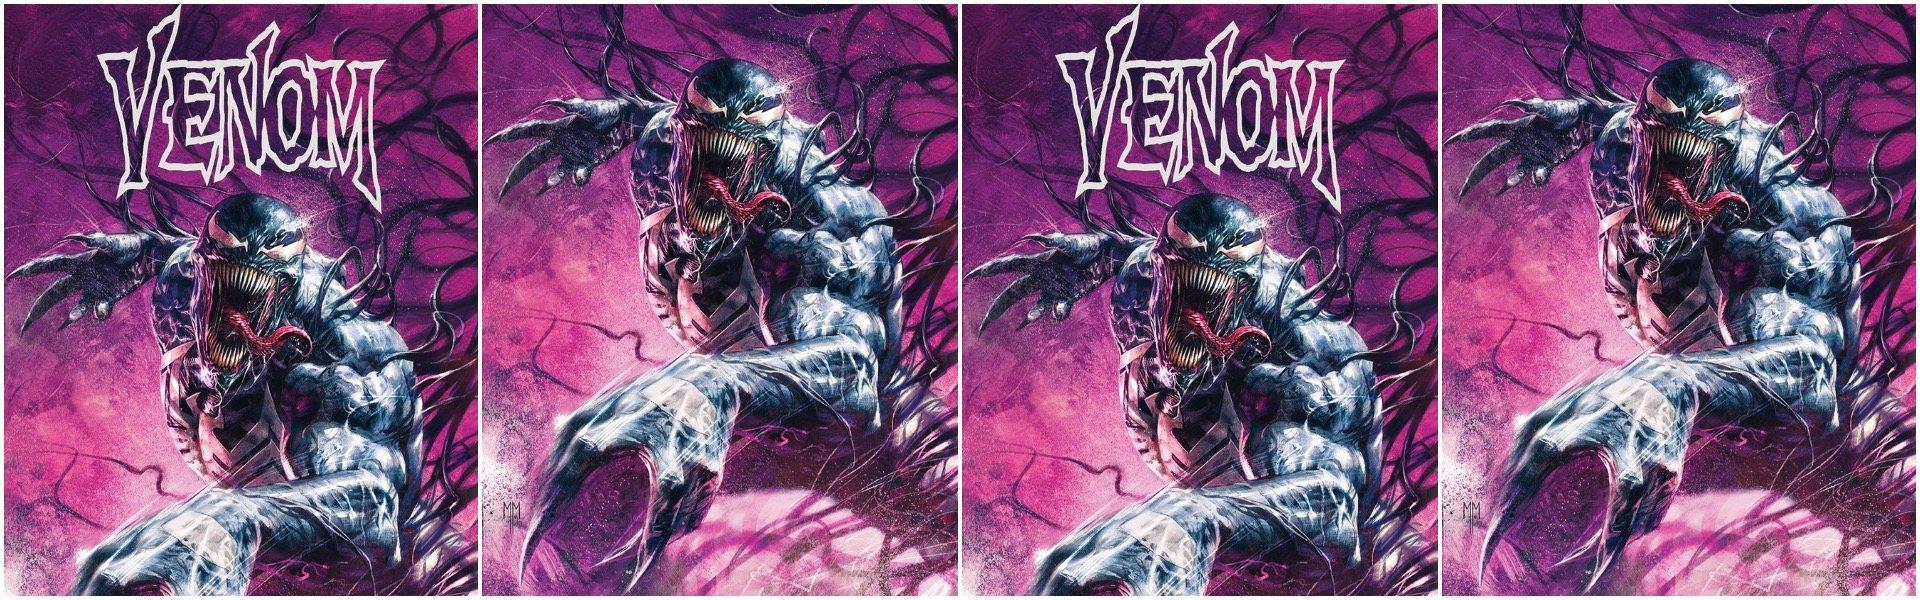 Venom #35 200th Issue Marco Mastrazzo Variants